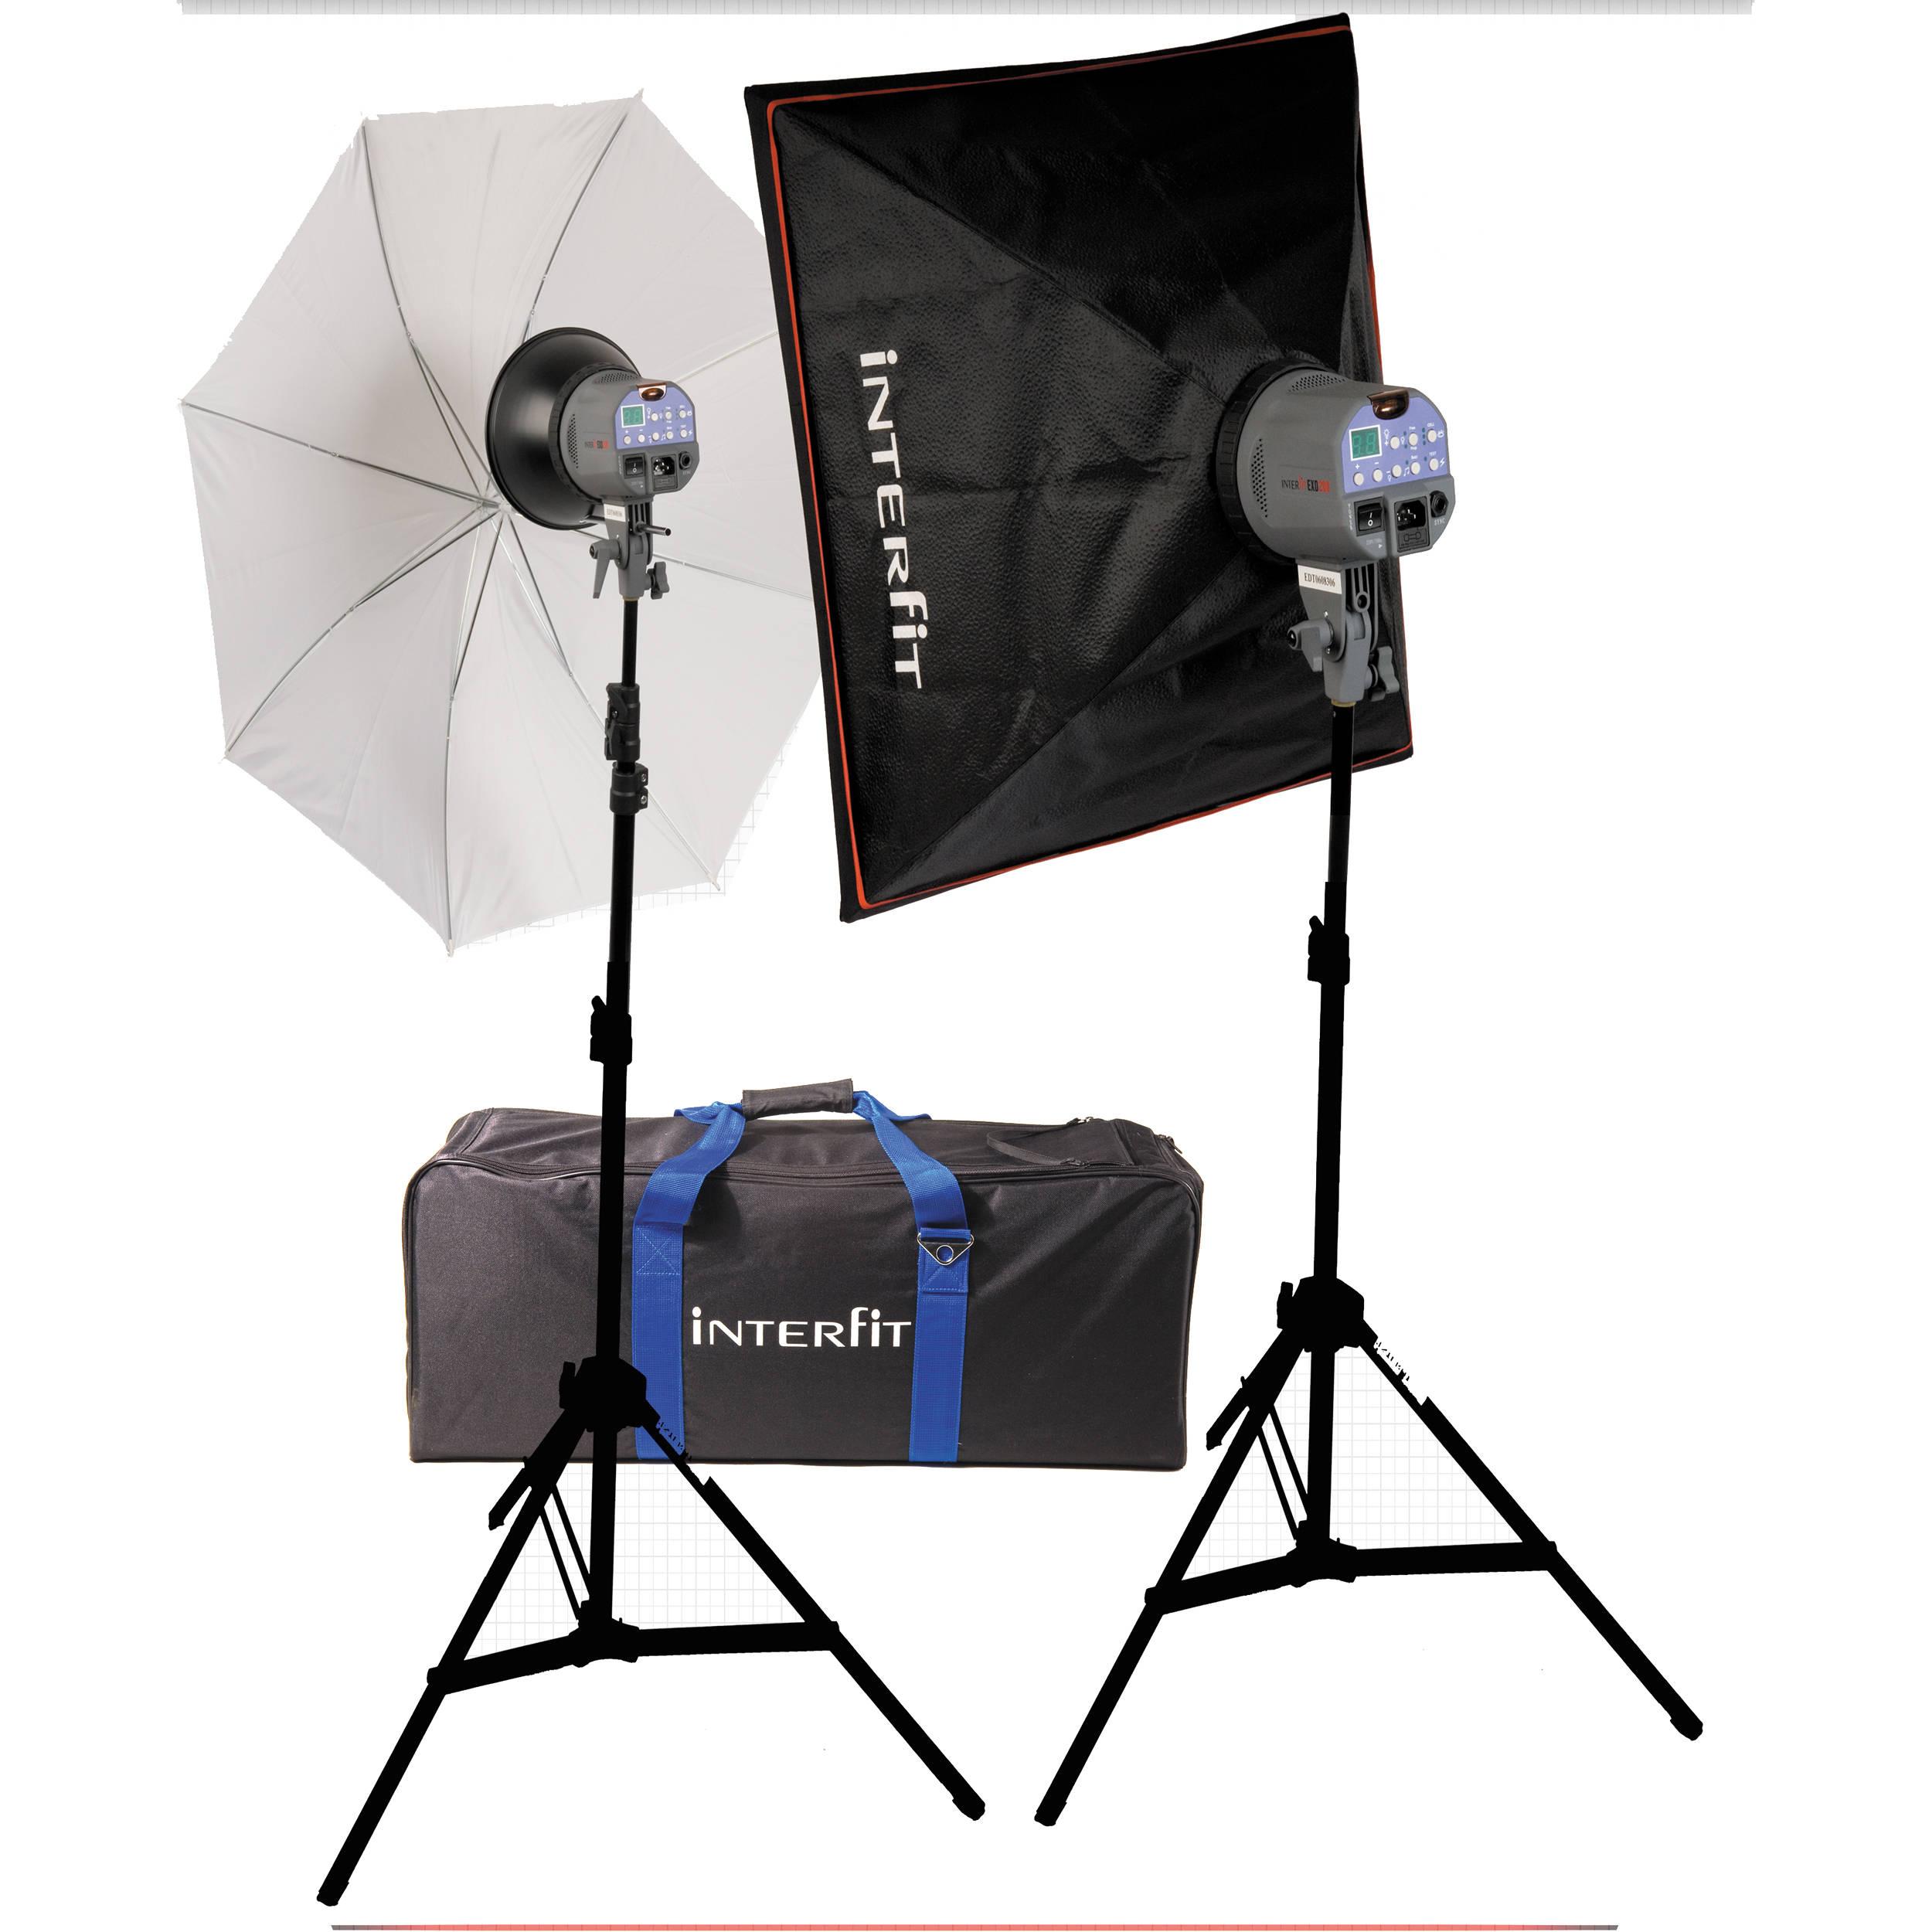 http://www.bakerphotovideo.com/studio-lighting-accessories/interfit-exd-200-kit